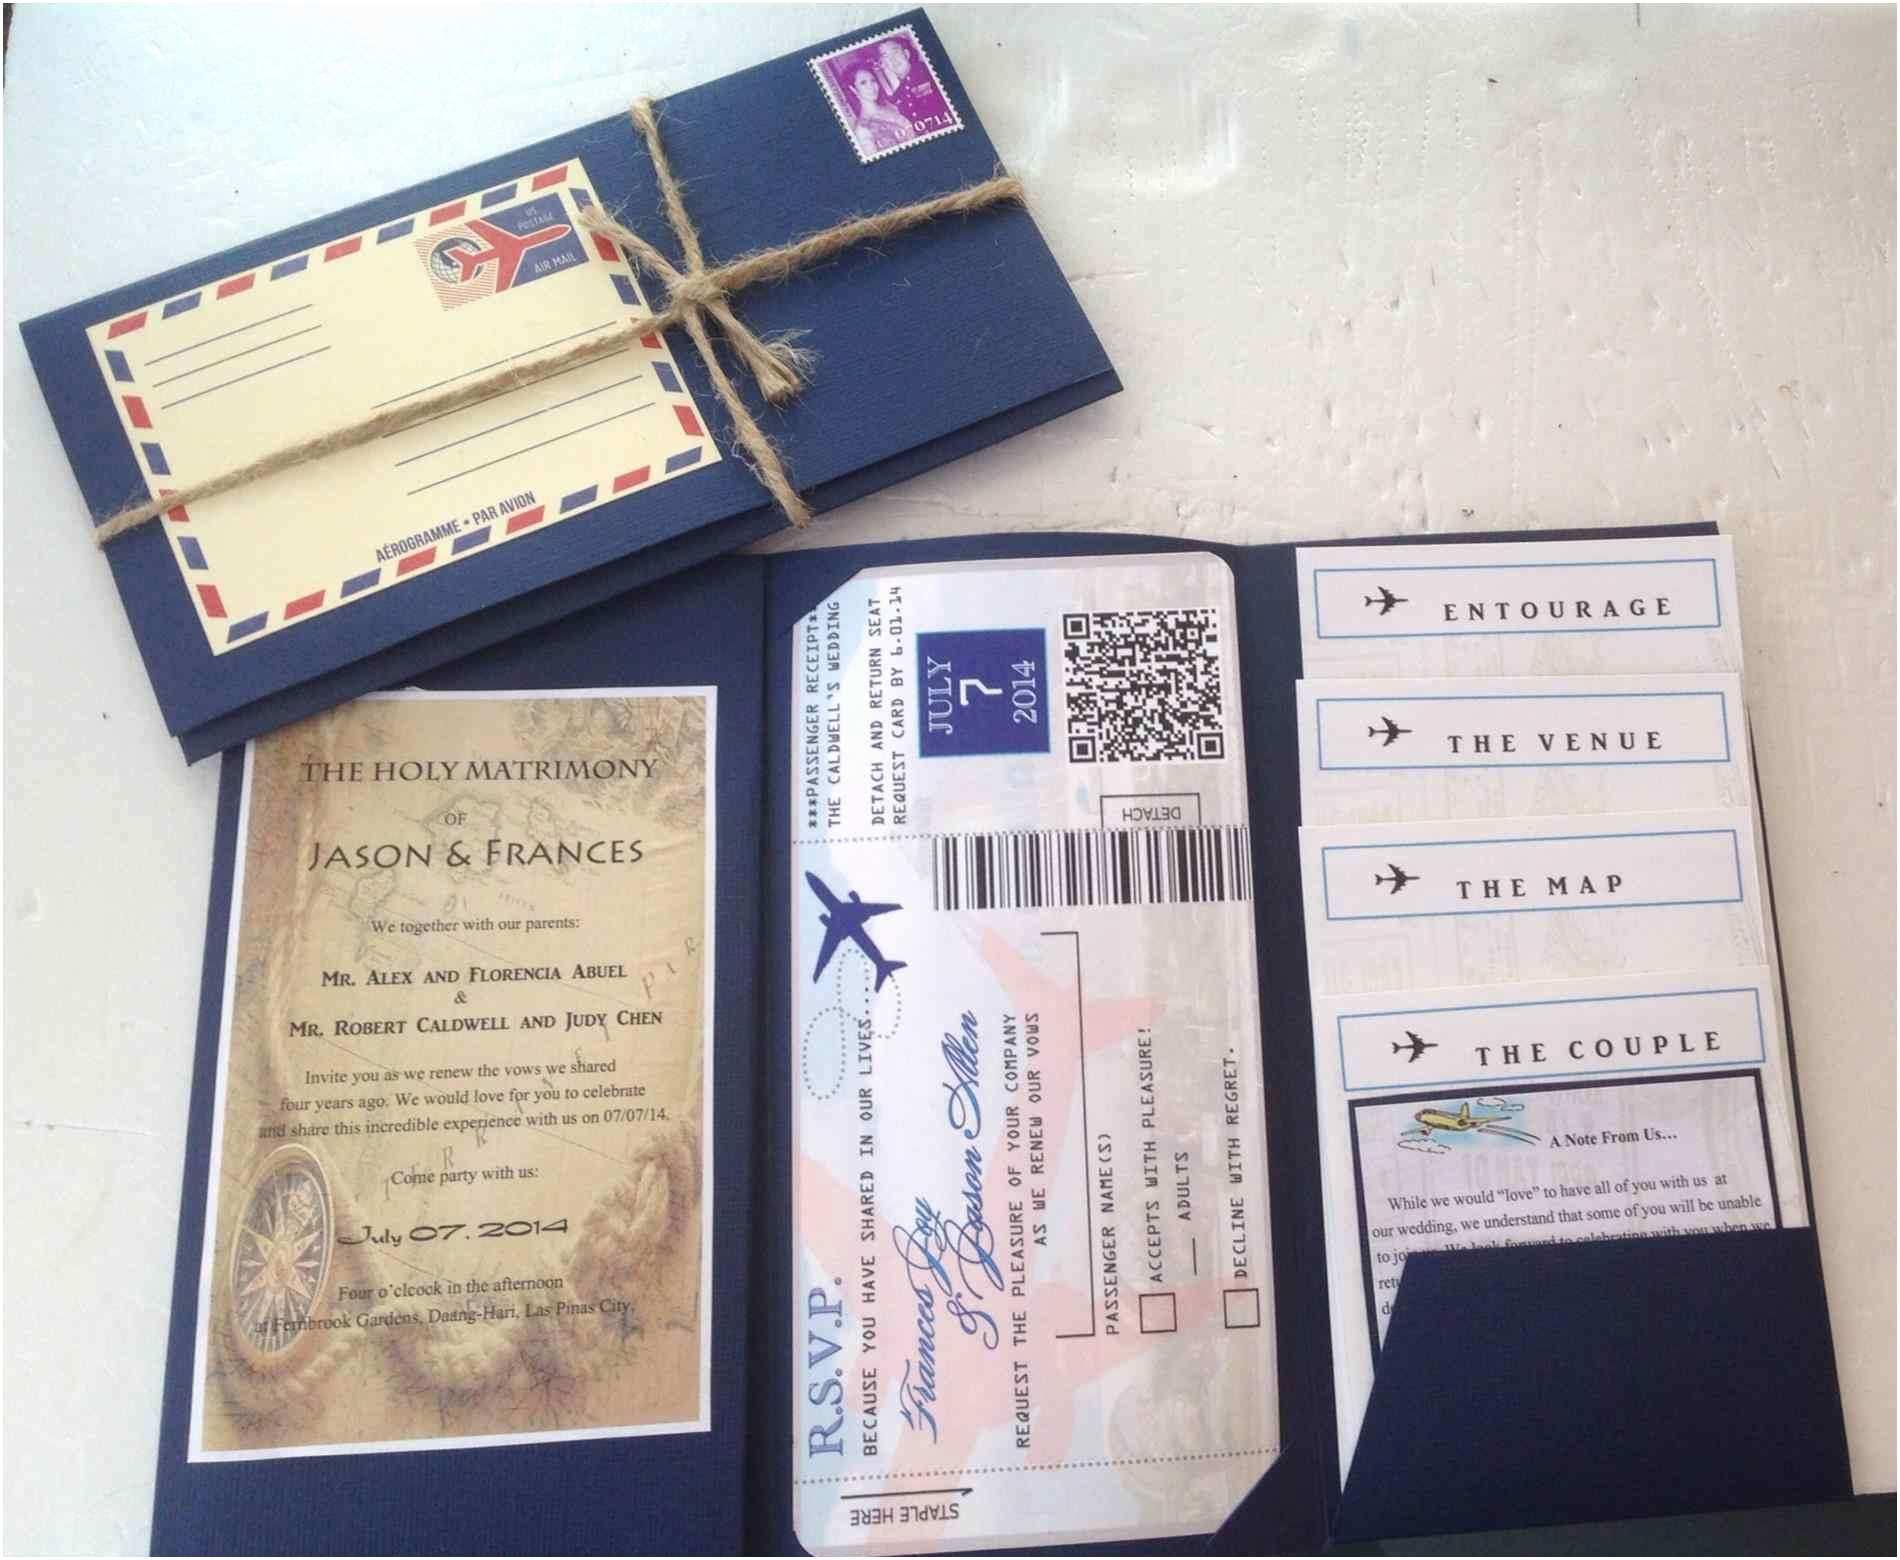 Destination Wedding Invitations Thailand and Boarding Pass Airline Ticket Casadebormela